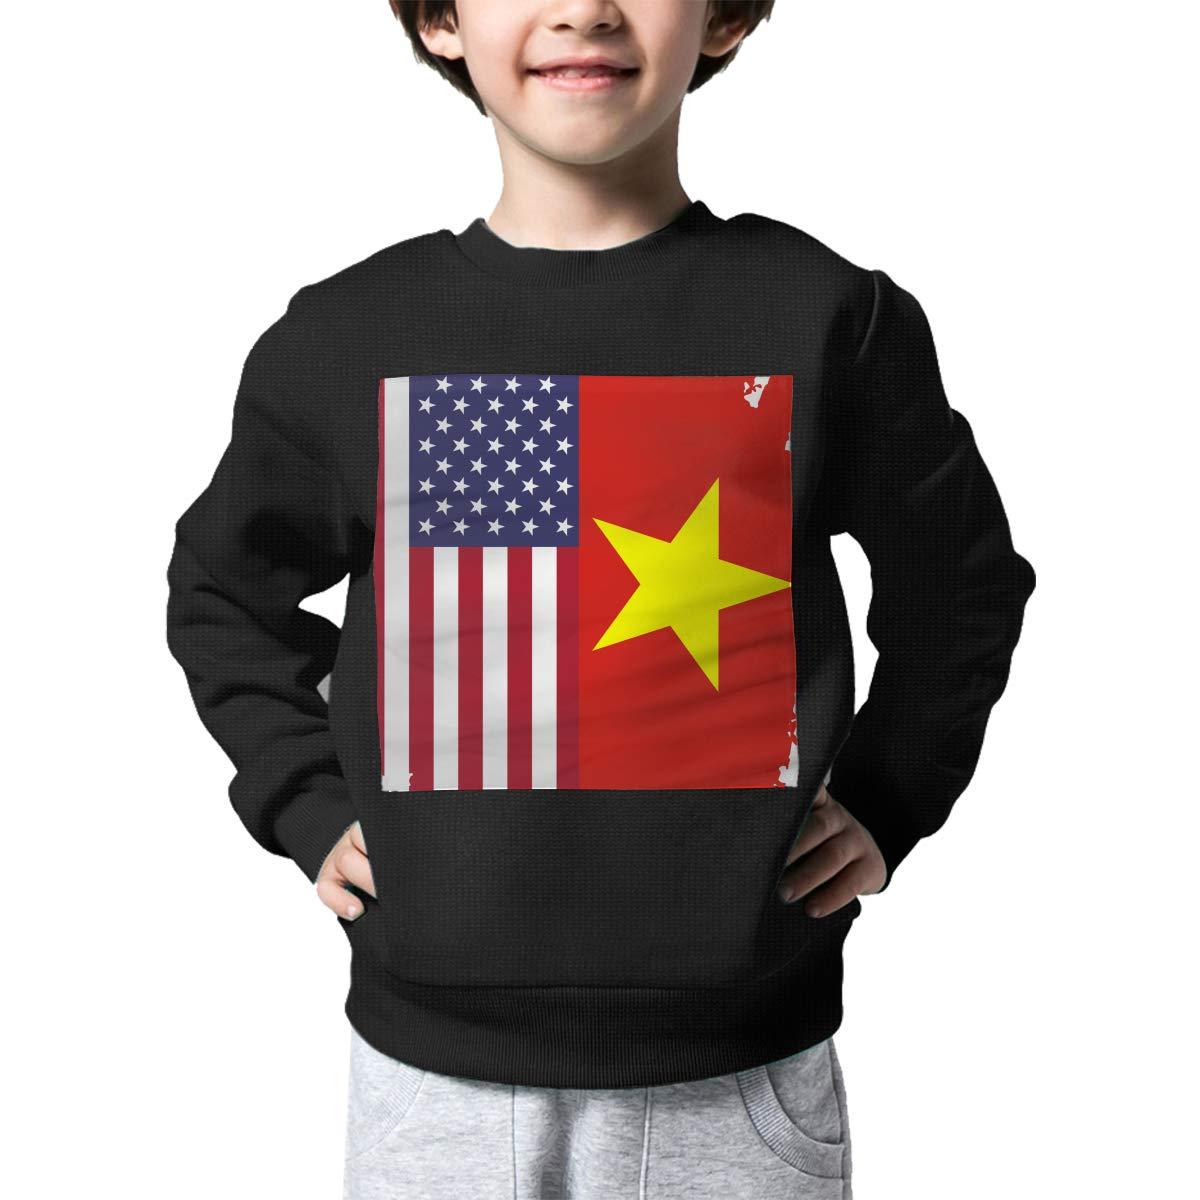 NJKM5MJ Boys Girls American Vietnam Flag Lovely Sweaters Soft Warm Unisex Children Kids Sweater